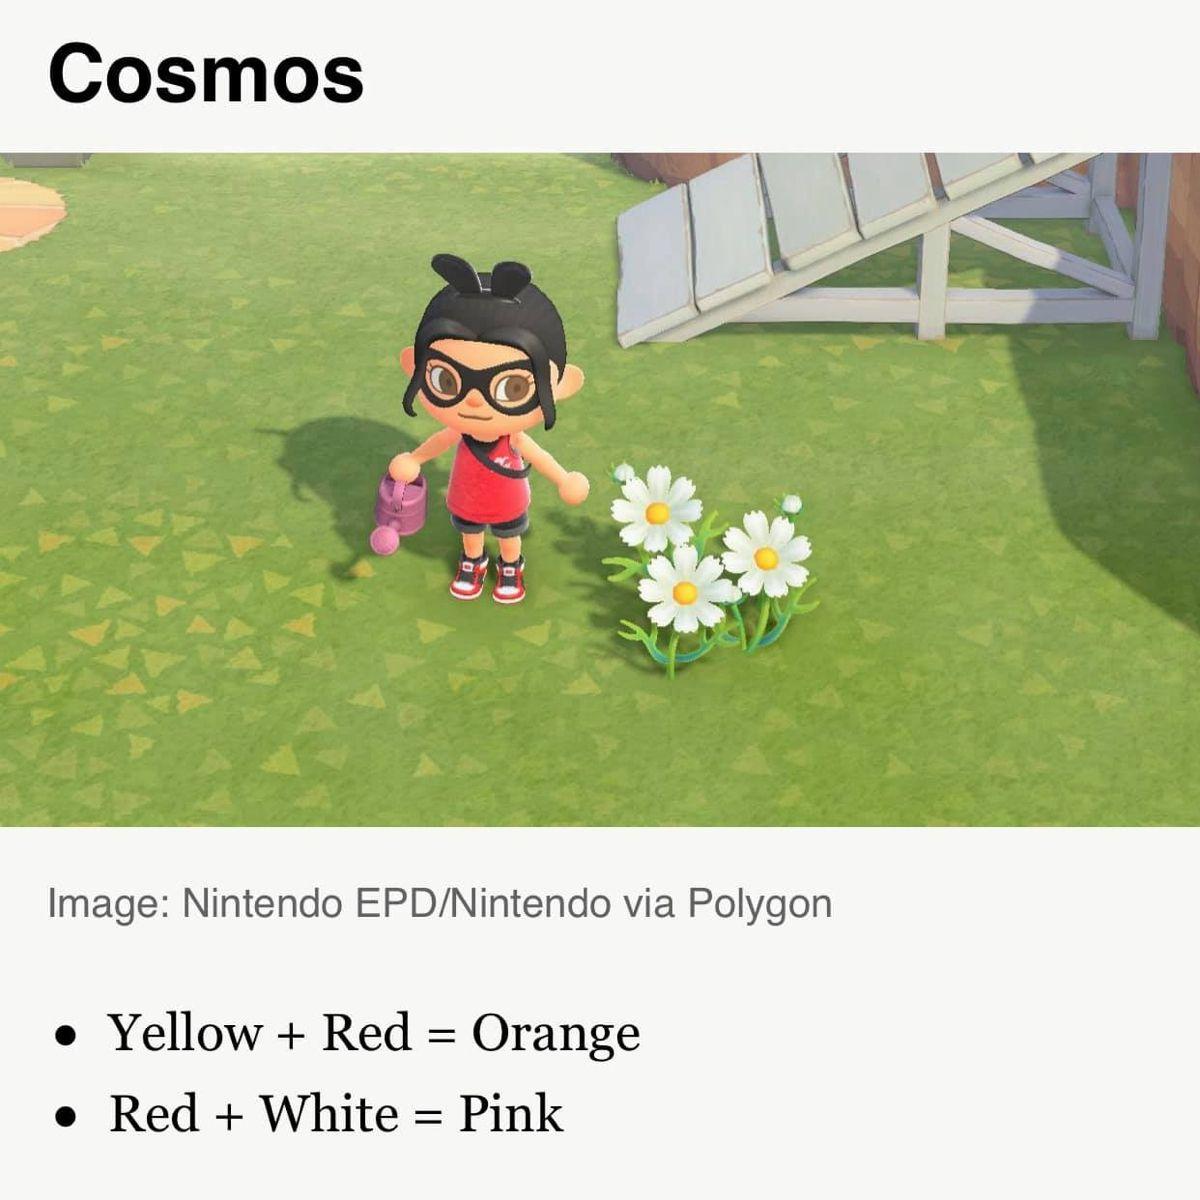 Acnh Flower Hybrid Guide In 2020 Animal Crossing Game Animal Crossing Qr Animal Crossing